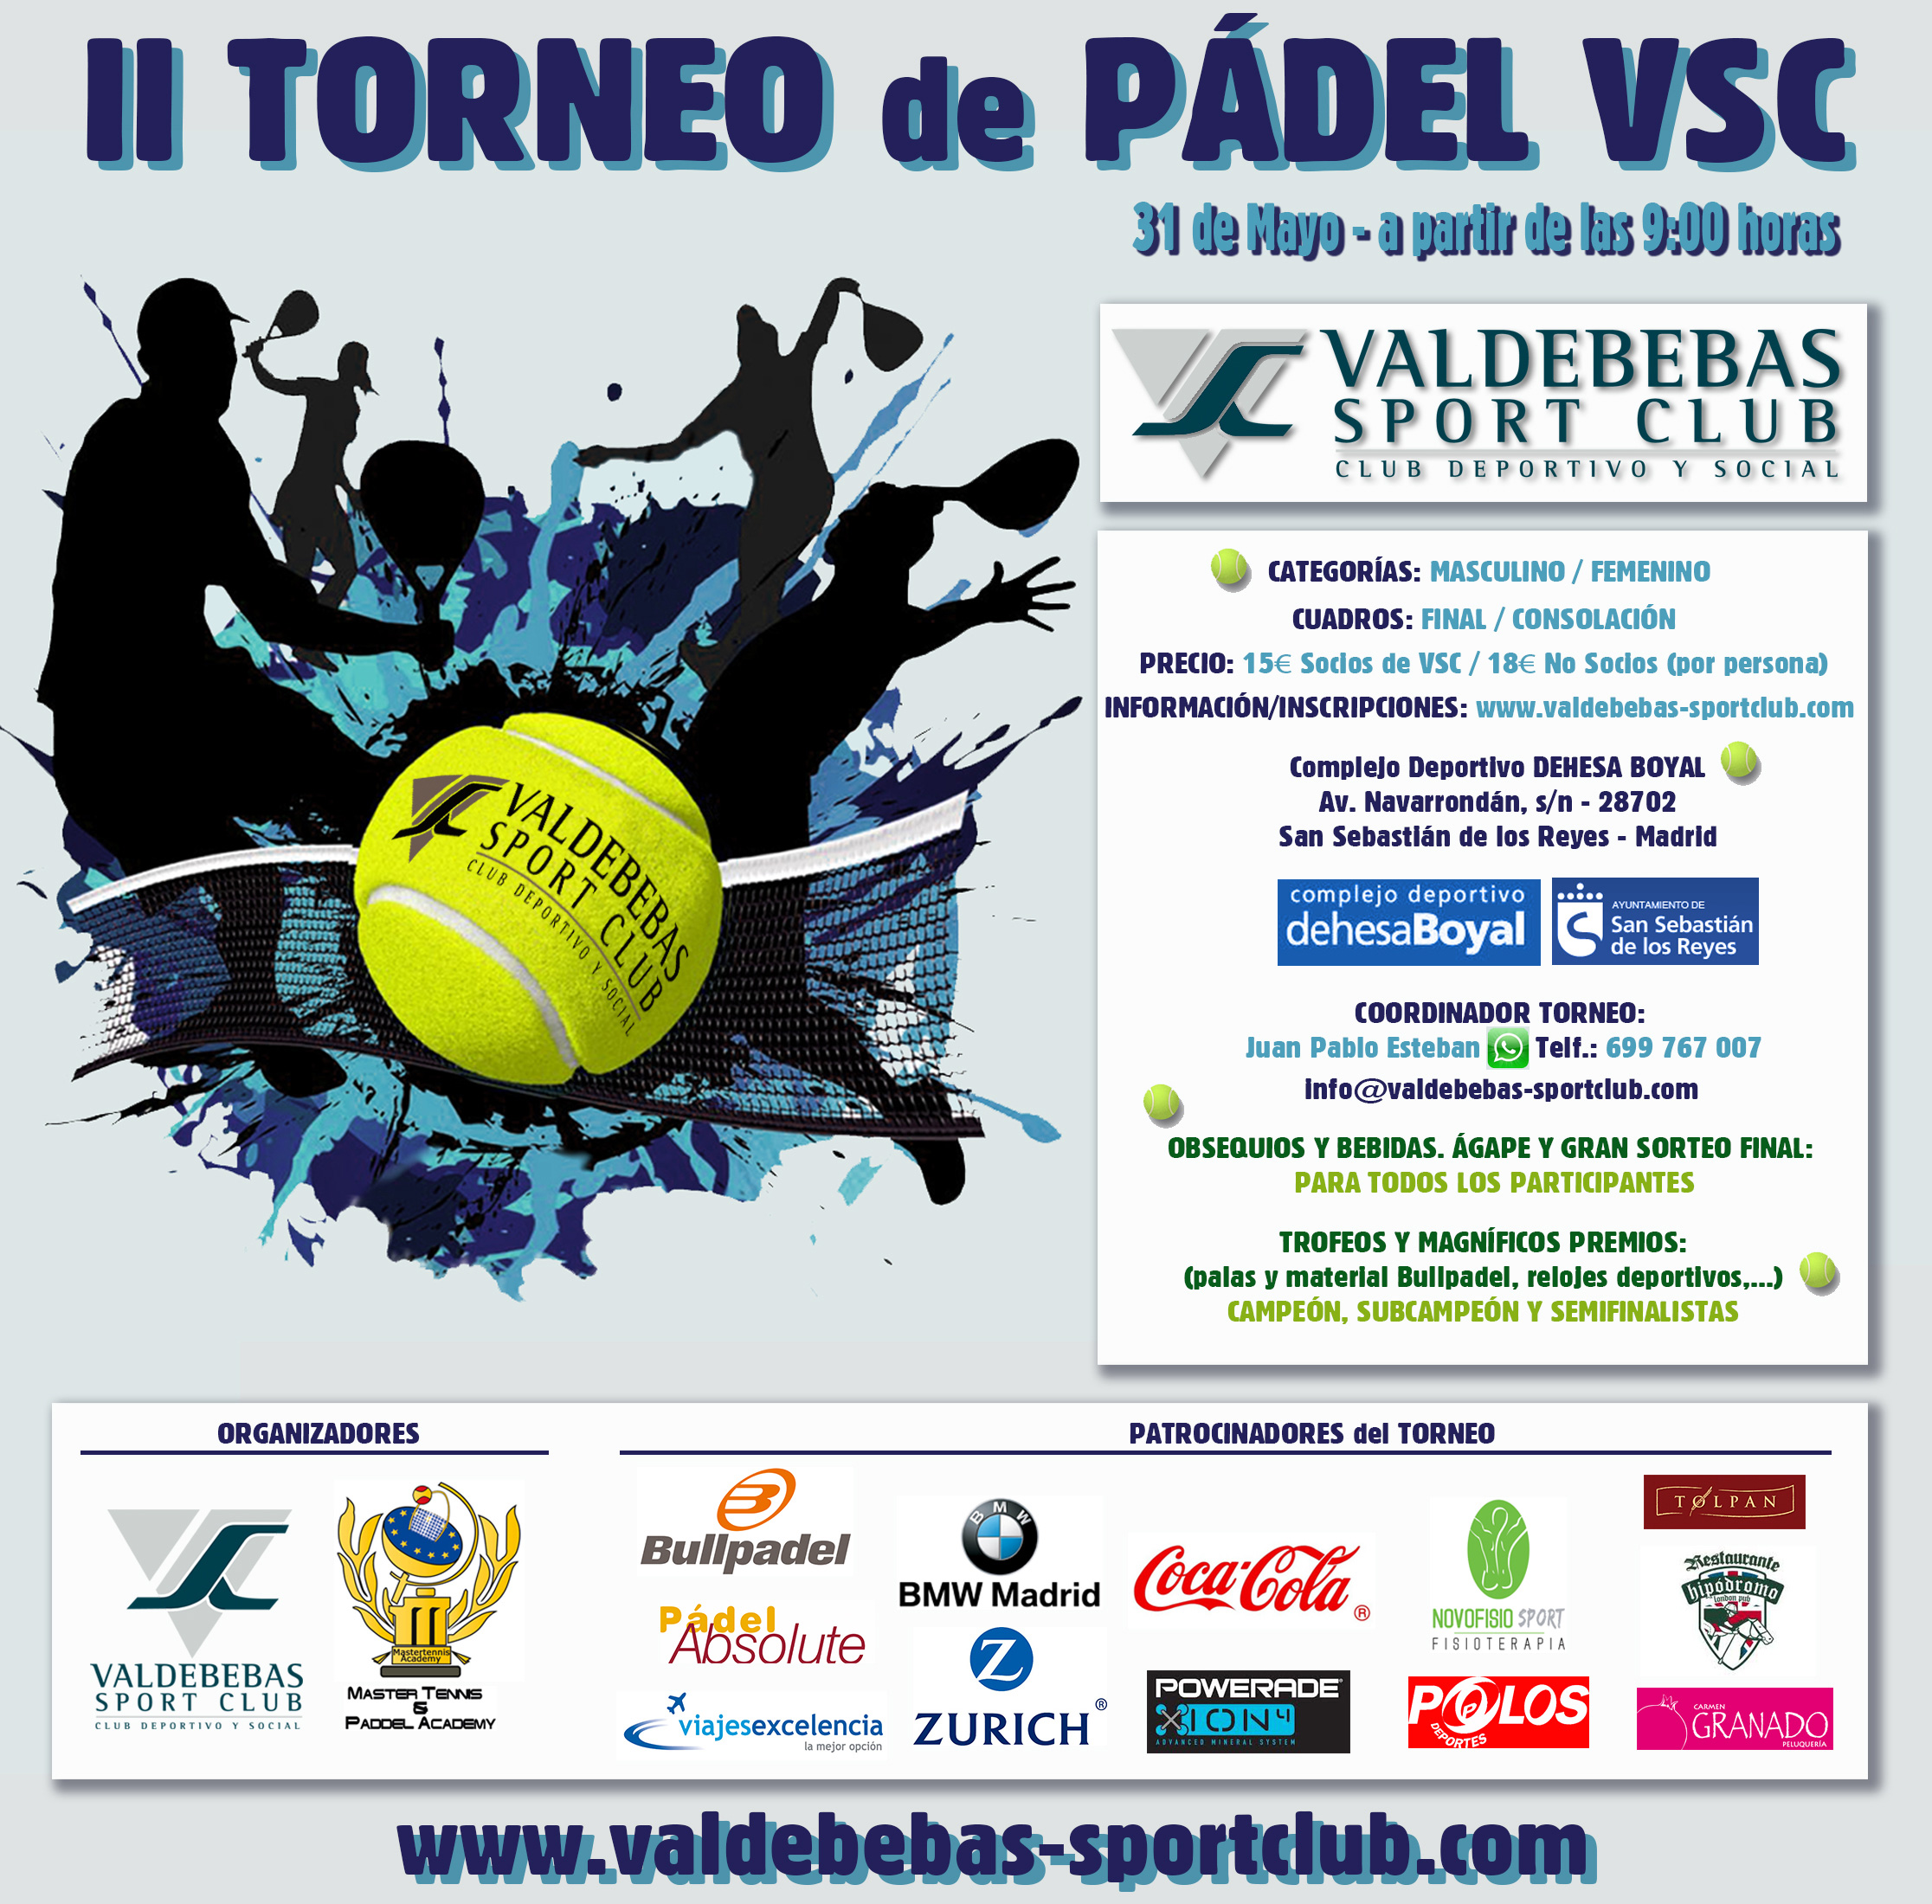 Cartel-II-Torneo-Pádel-VSC